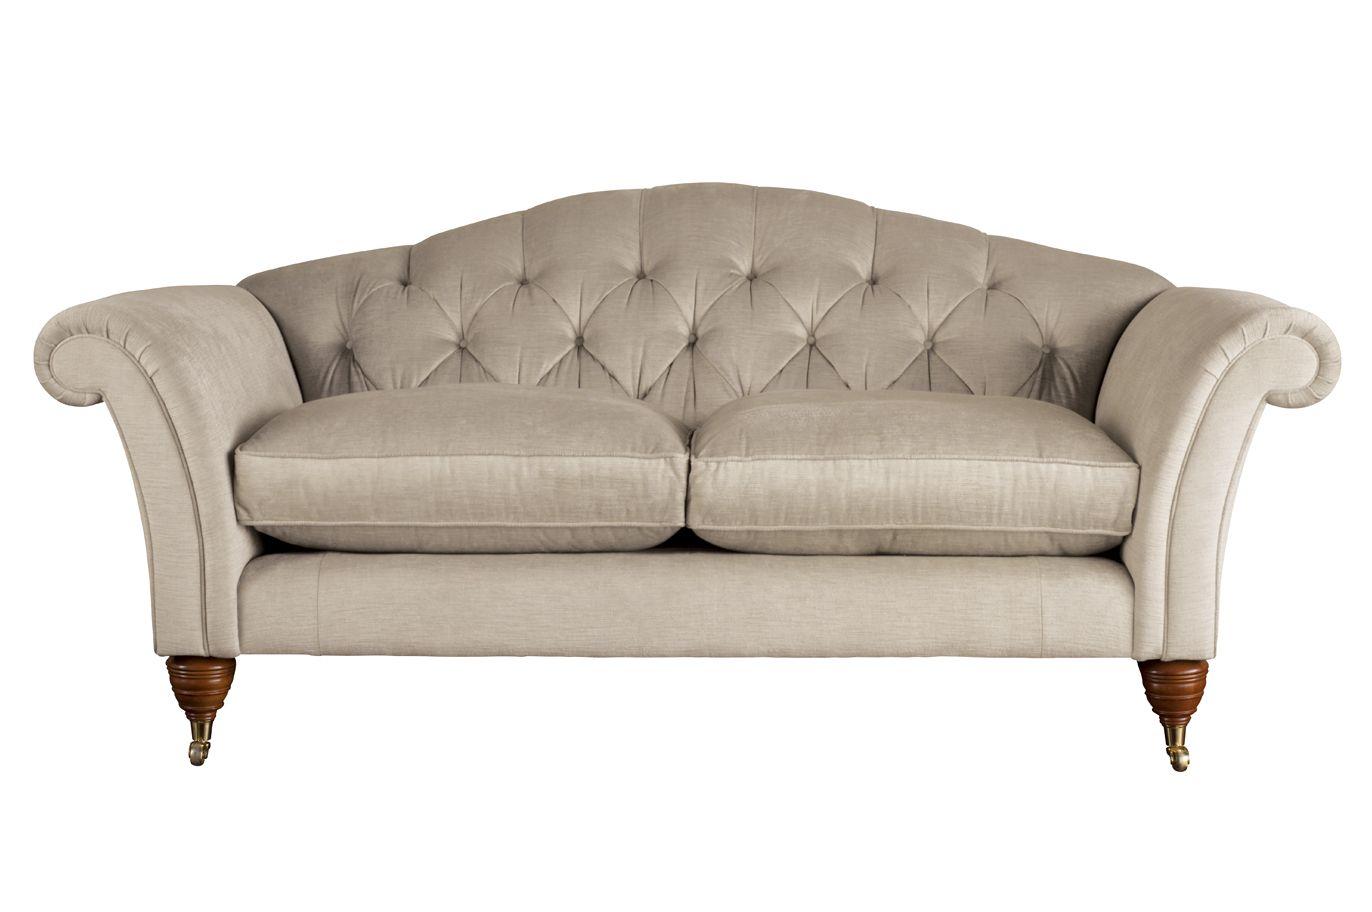 Farnborough Upholstered Large 2 Seater Sofa Laura Ashley Made To